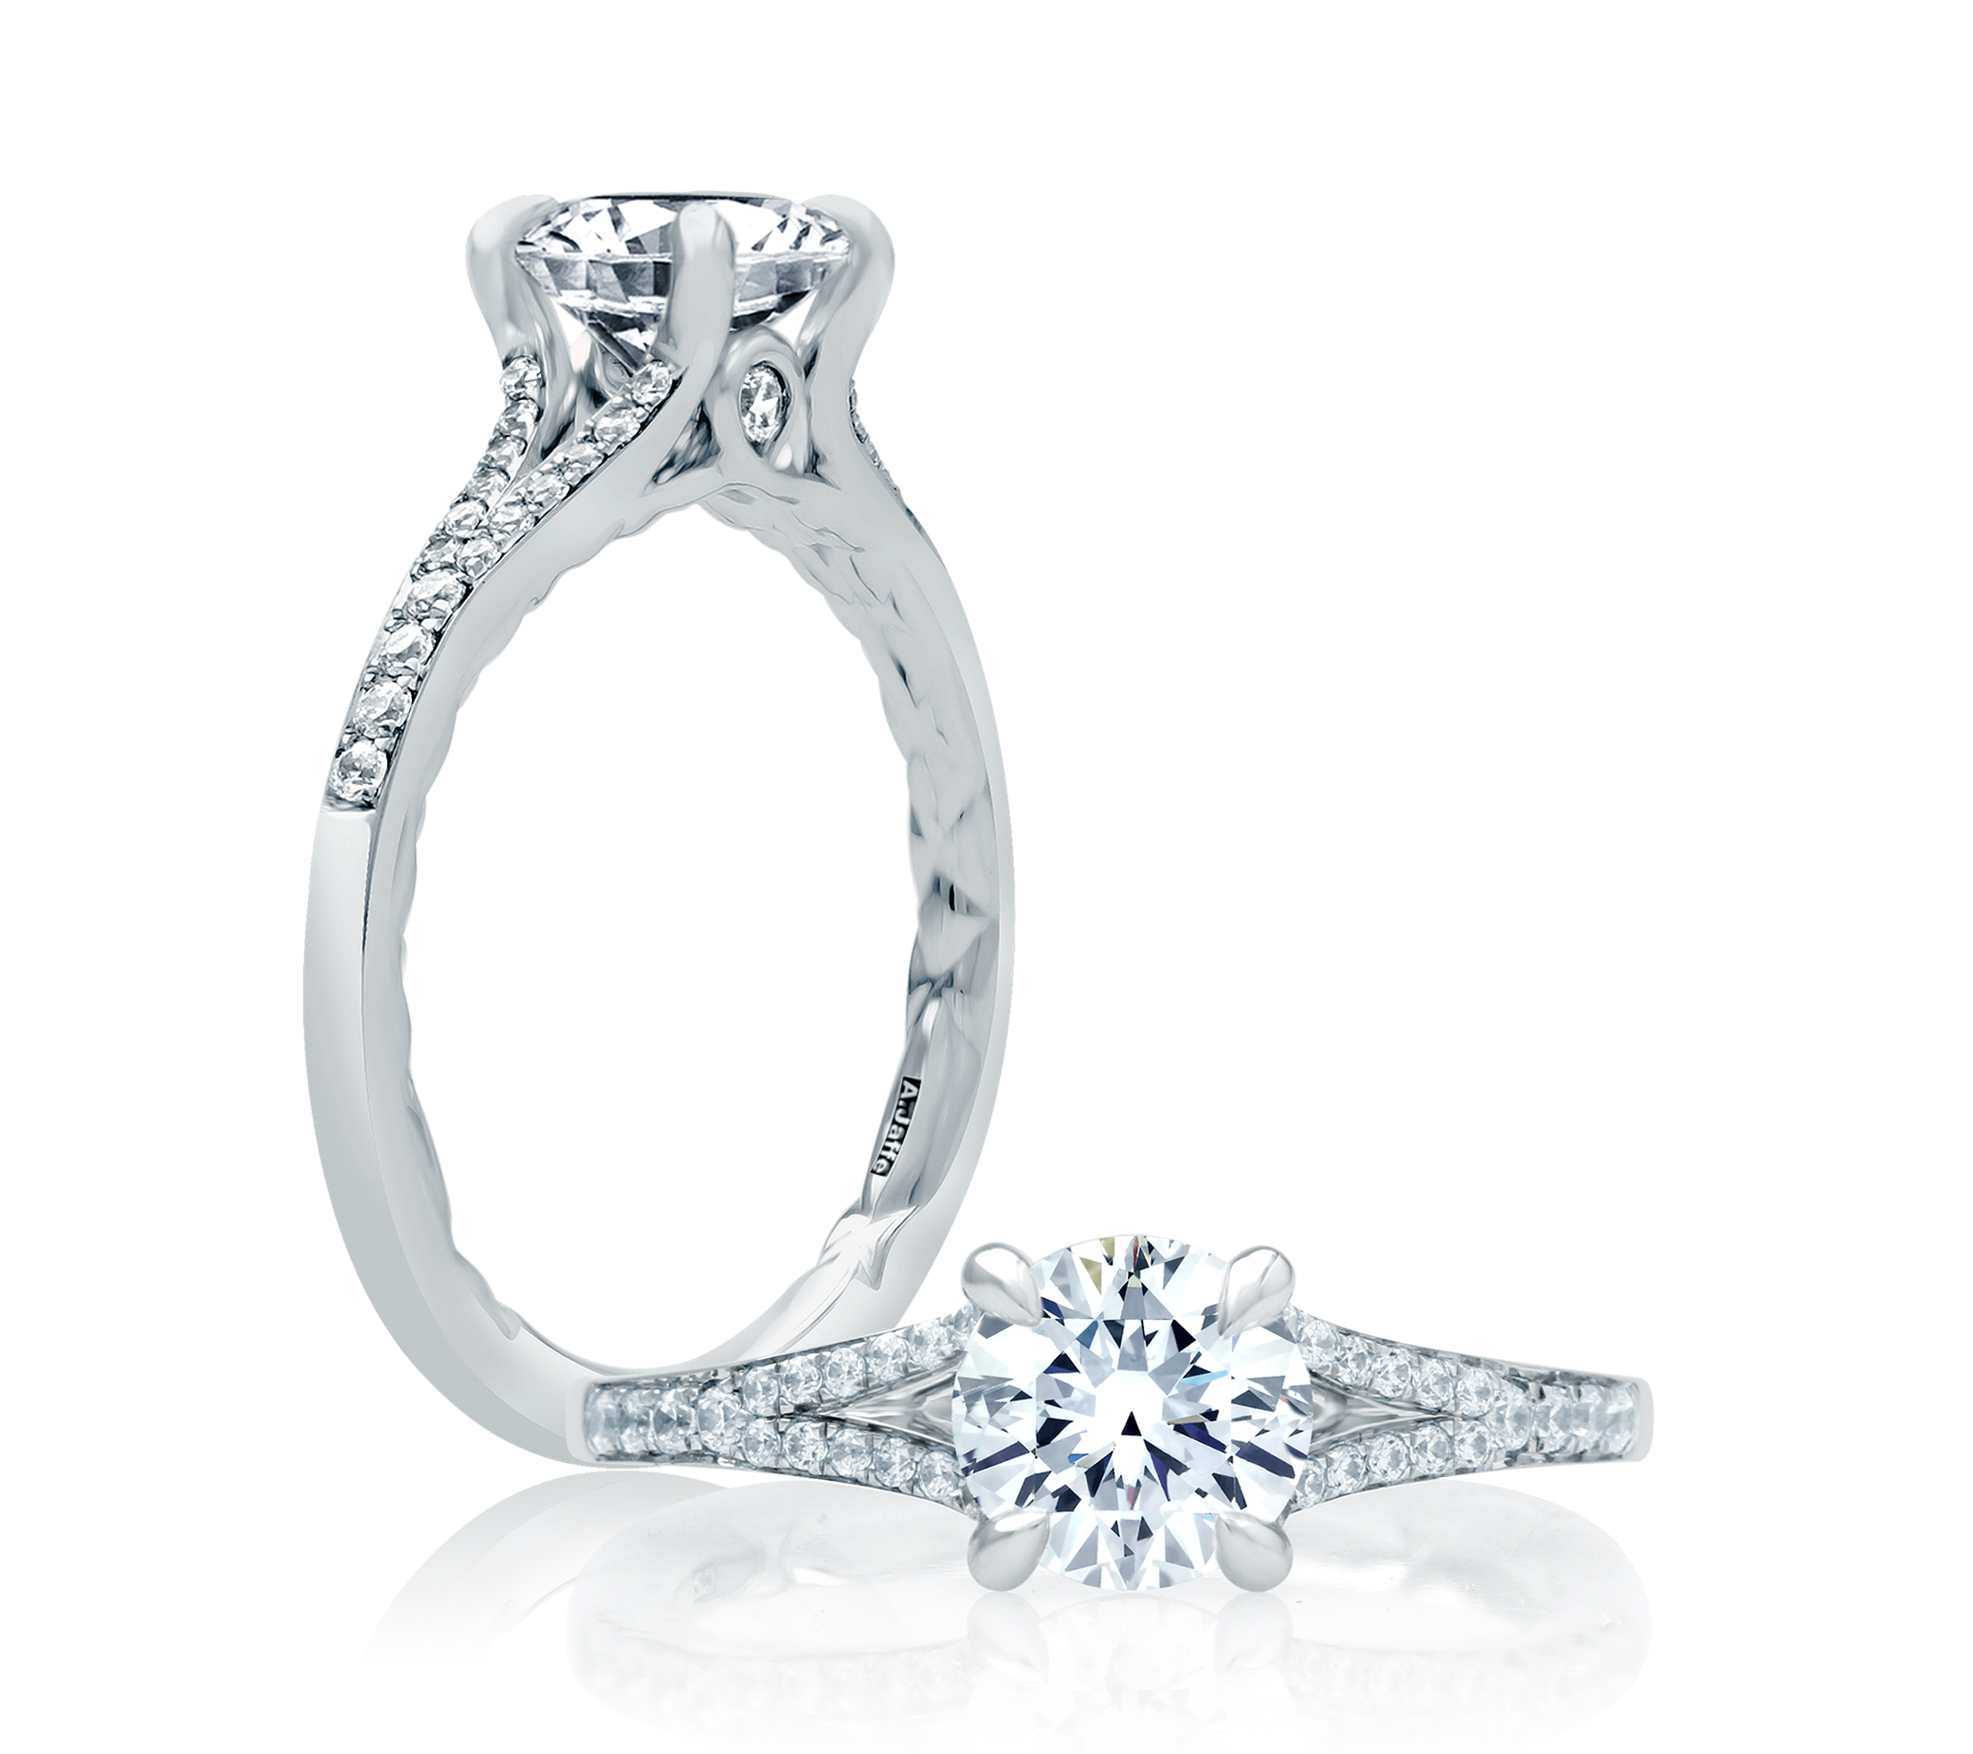 A.Jaffe Rings | Camarillo, CA | Van Gundy Jewelers